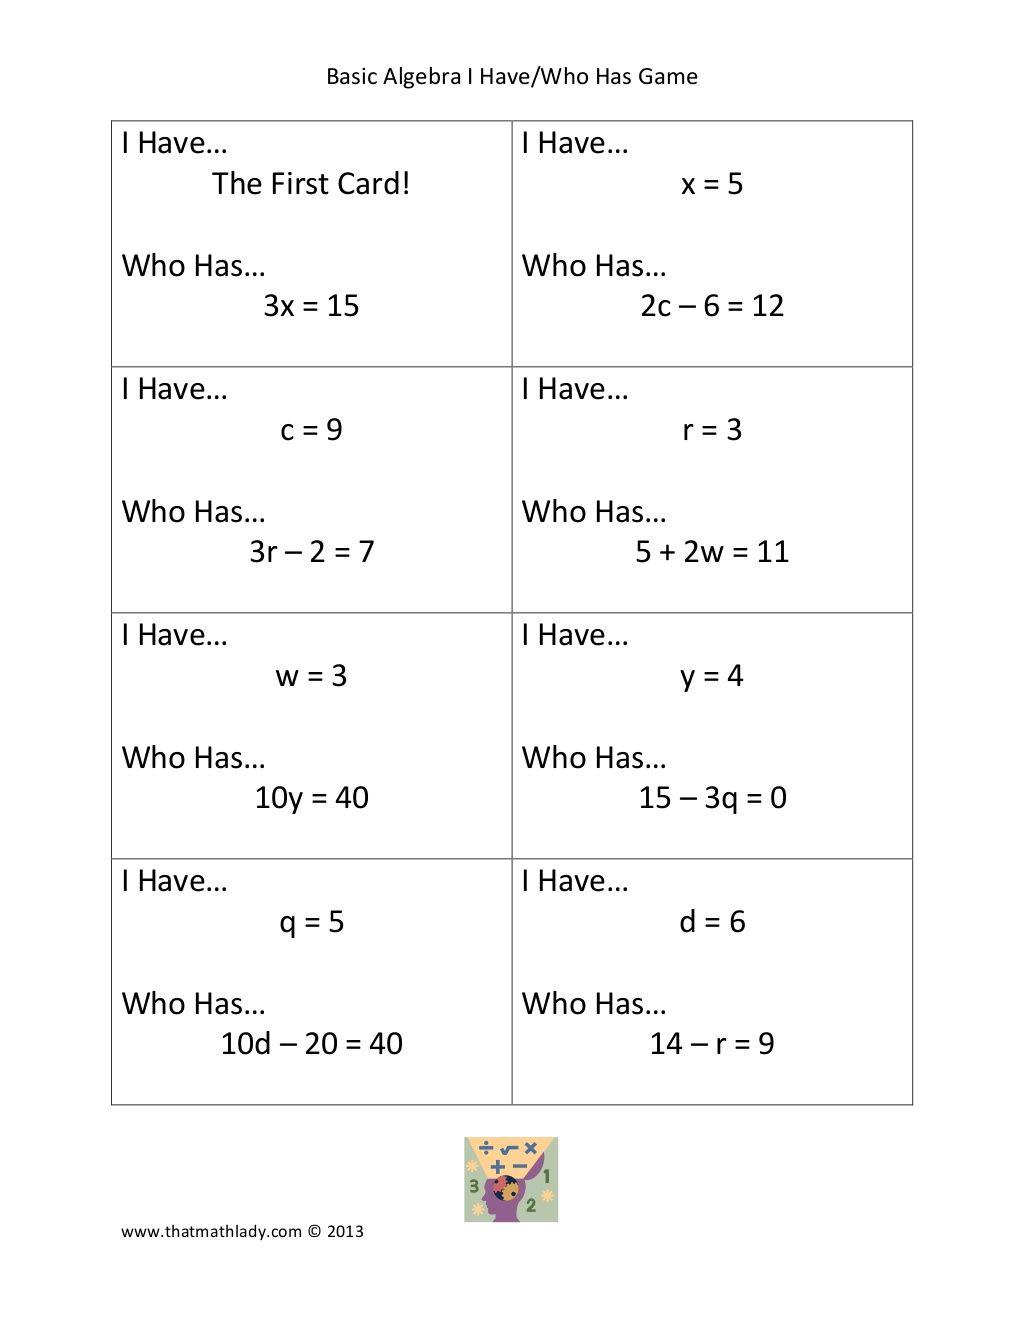 basic-algebra-i-havewho-has-game by Thatmathlady via Slideshare ...